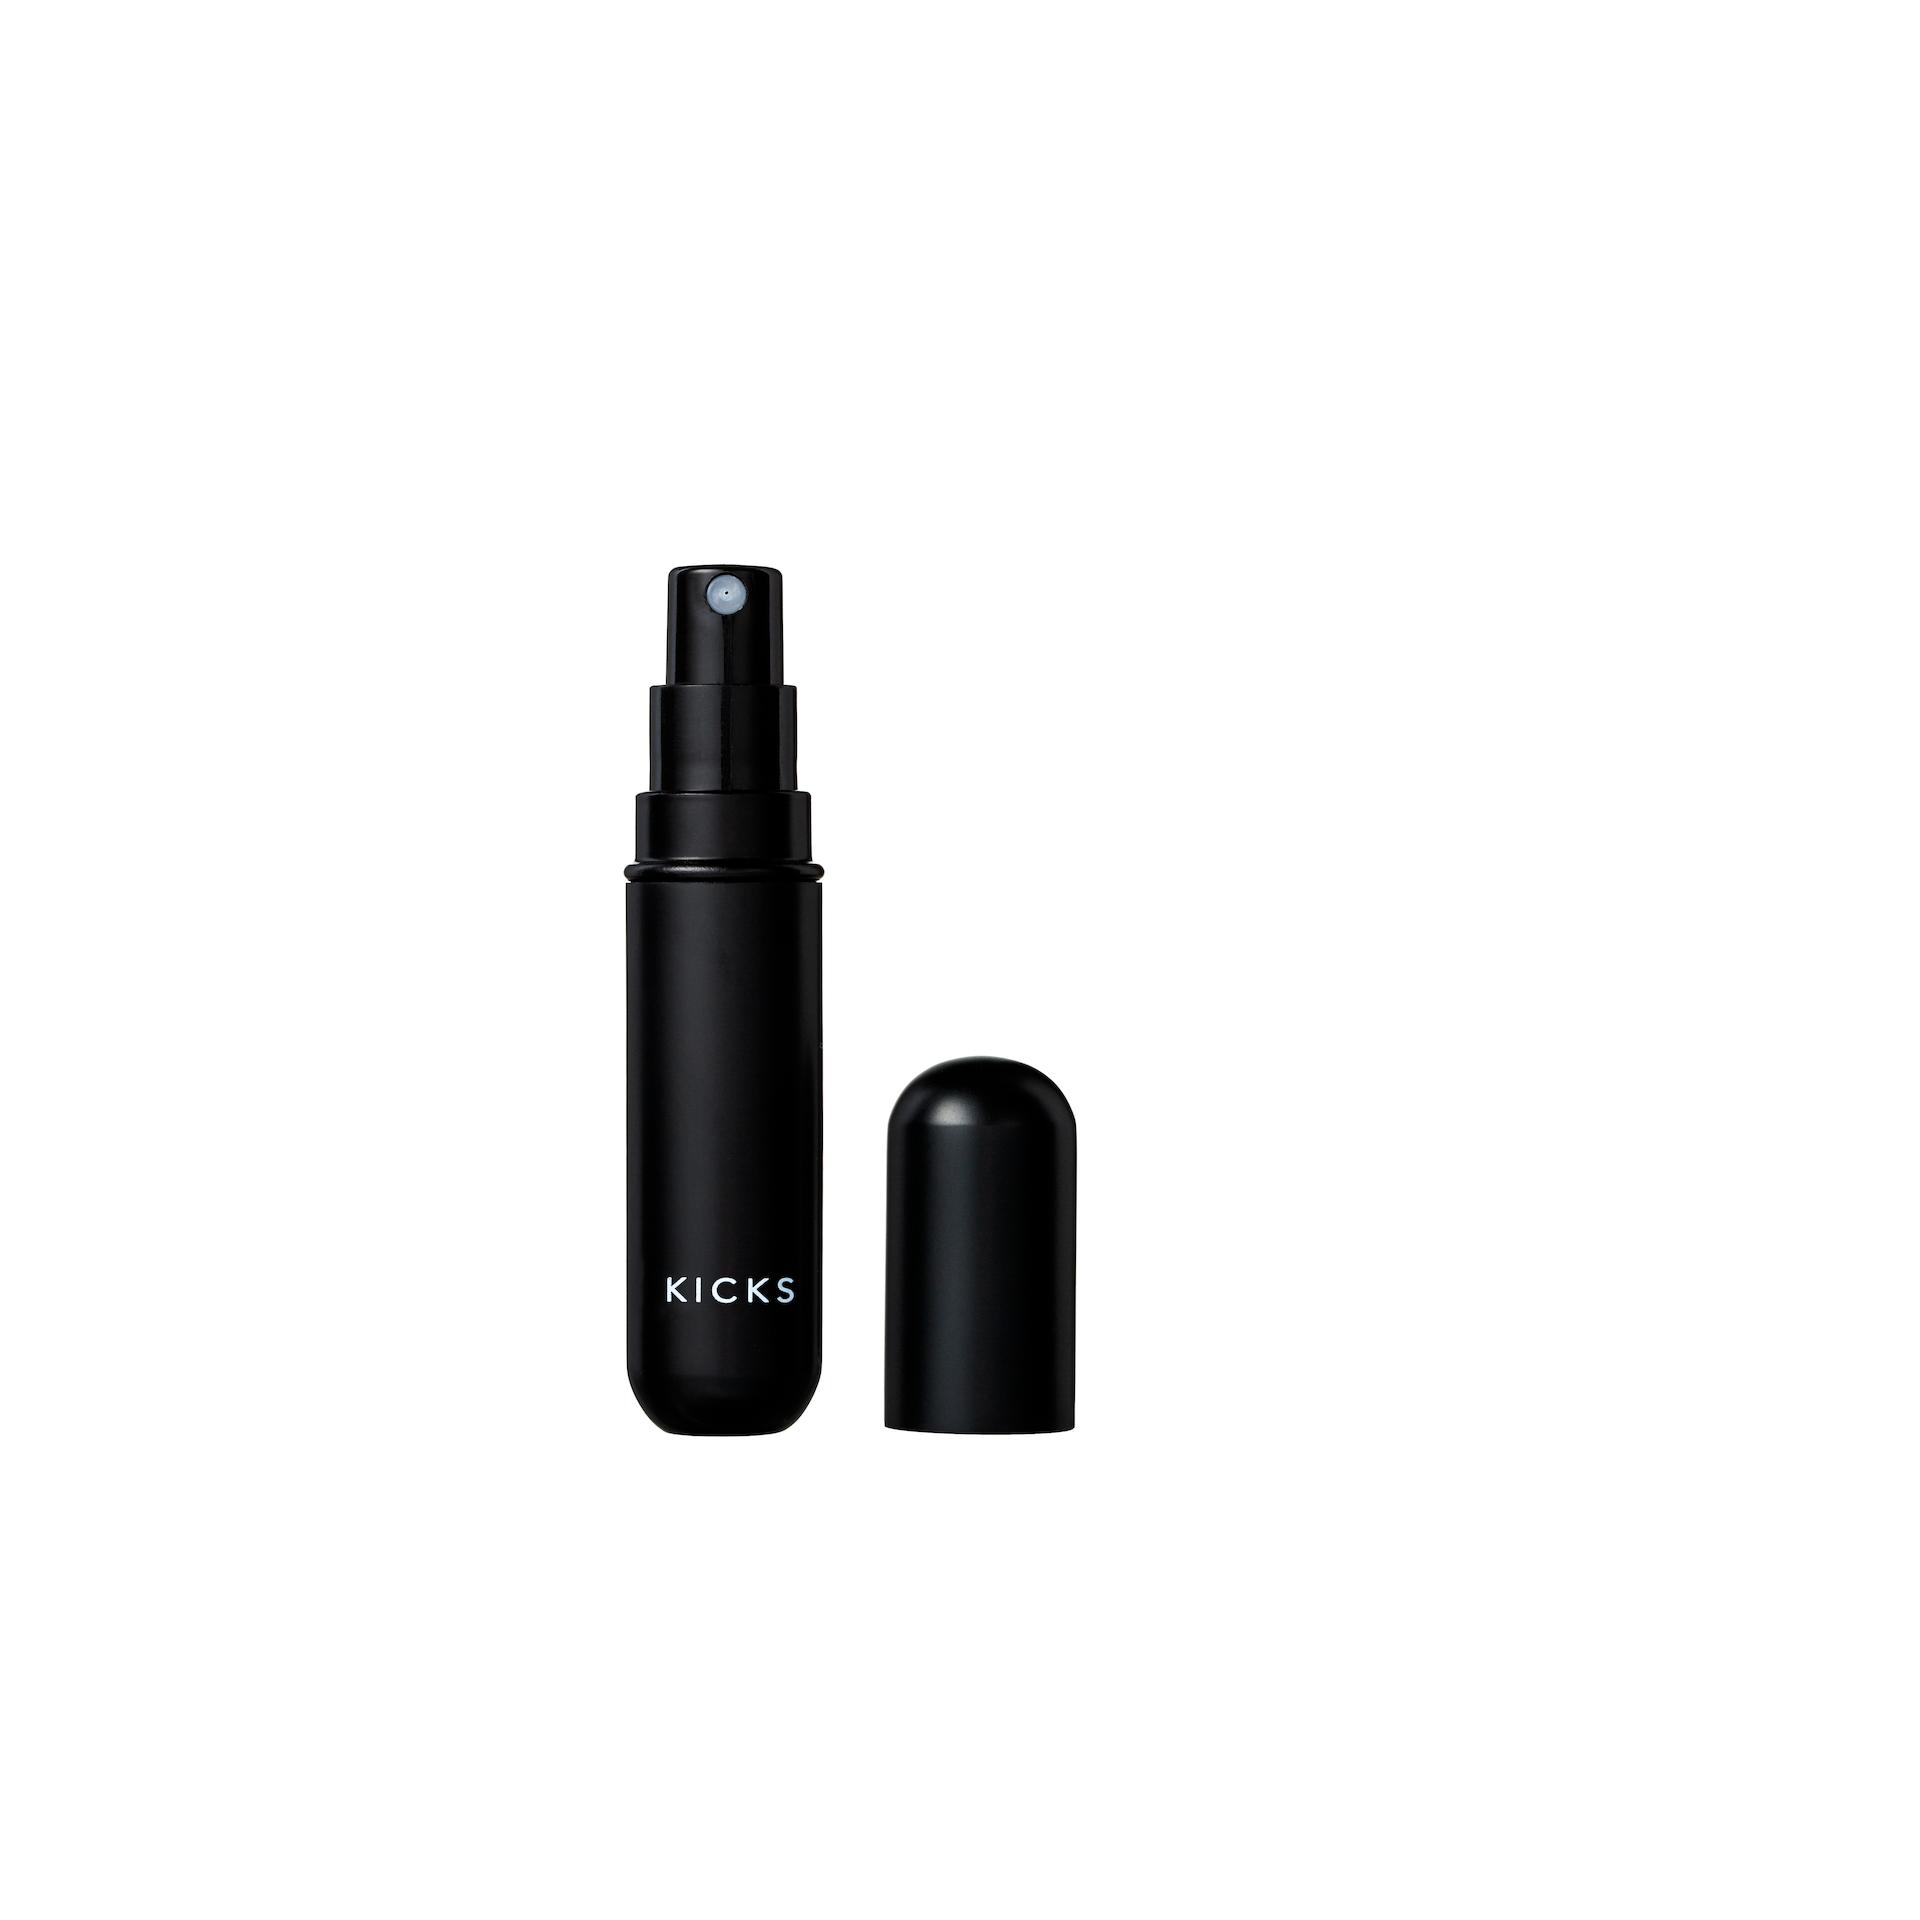 Perfume Atomizer Black